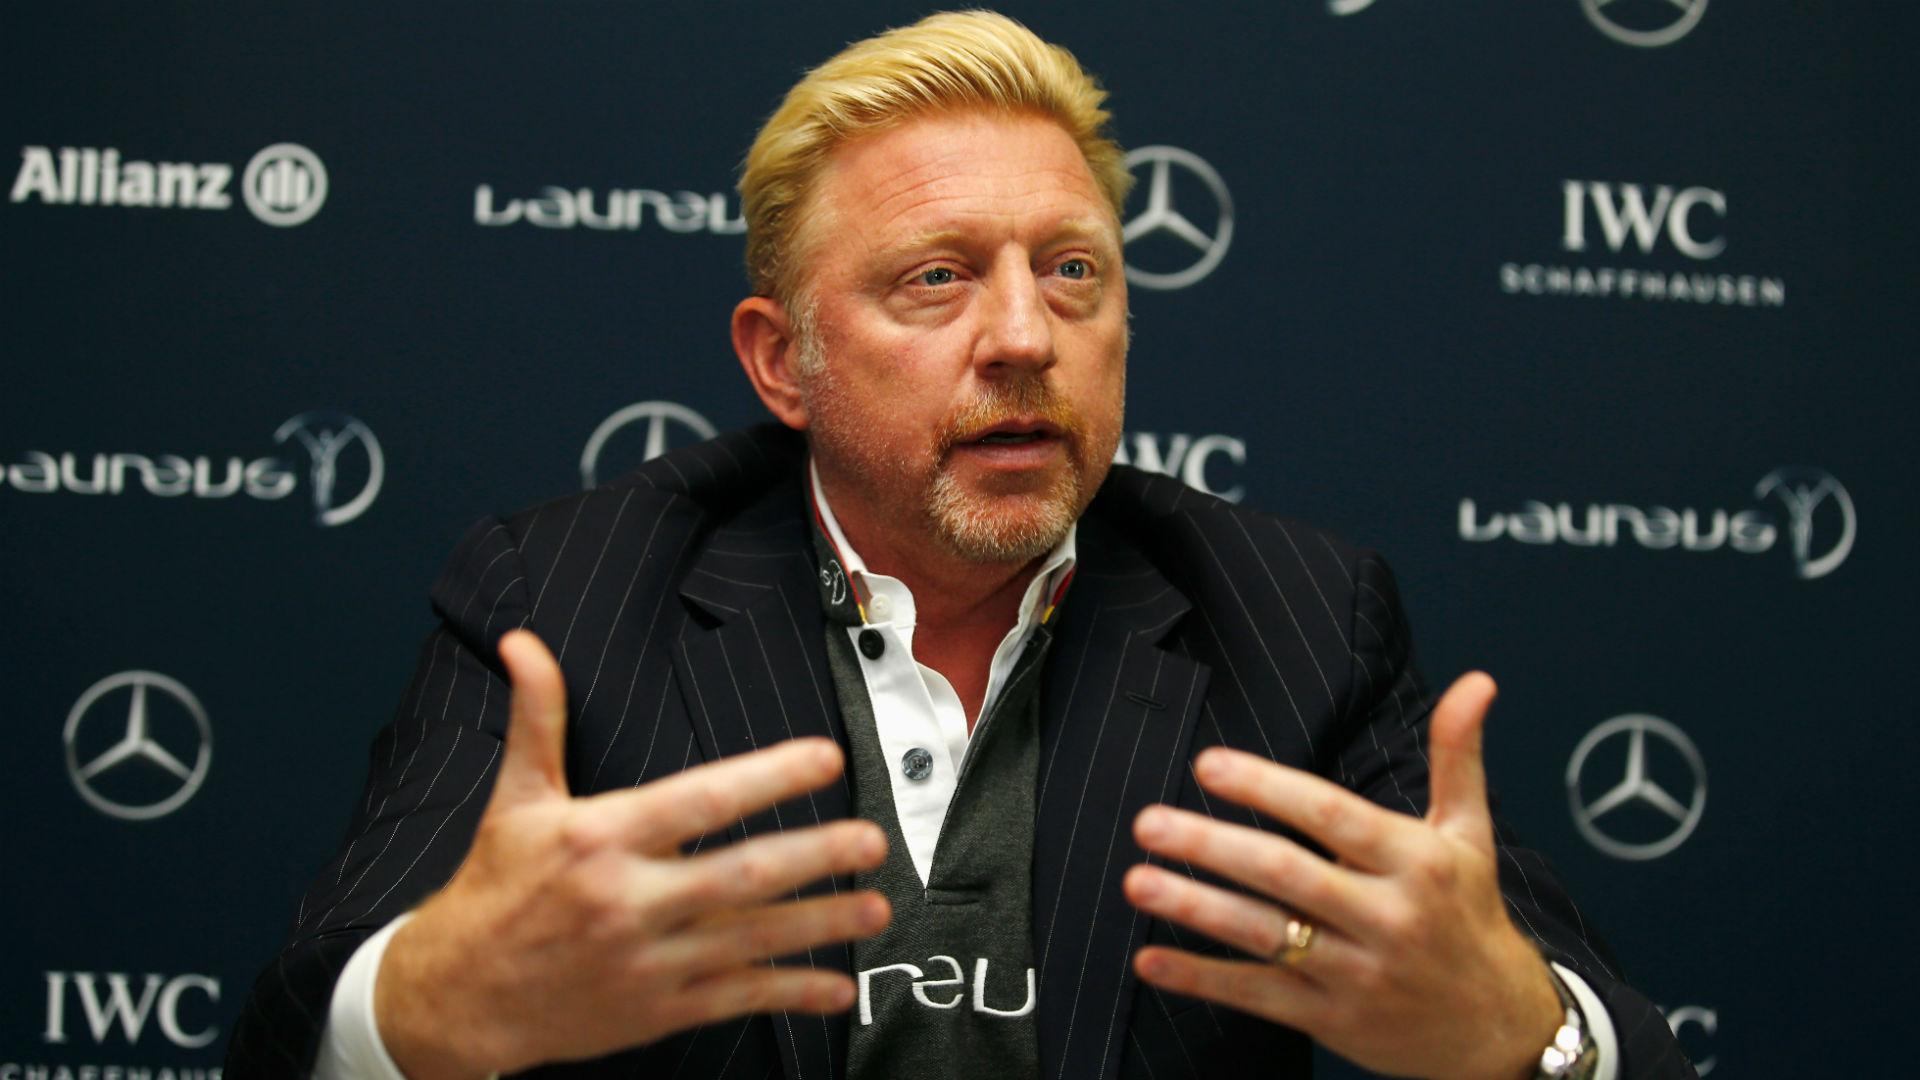 Six time Grand Slam winner Boris Becker declared bankrupt